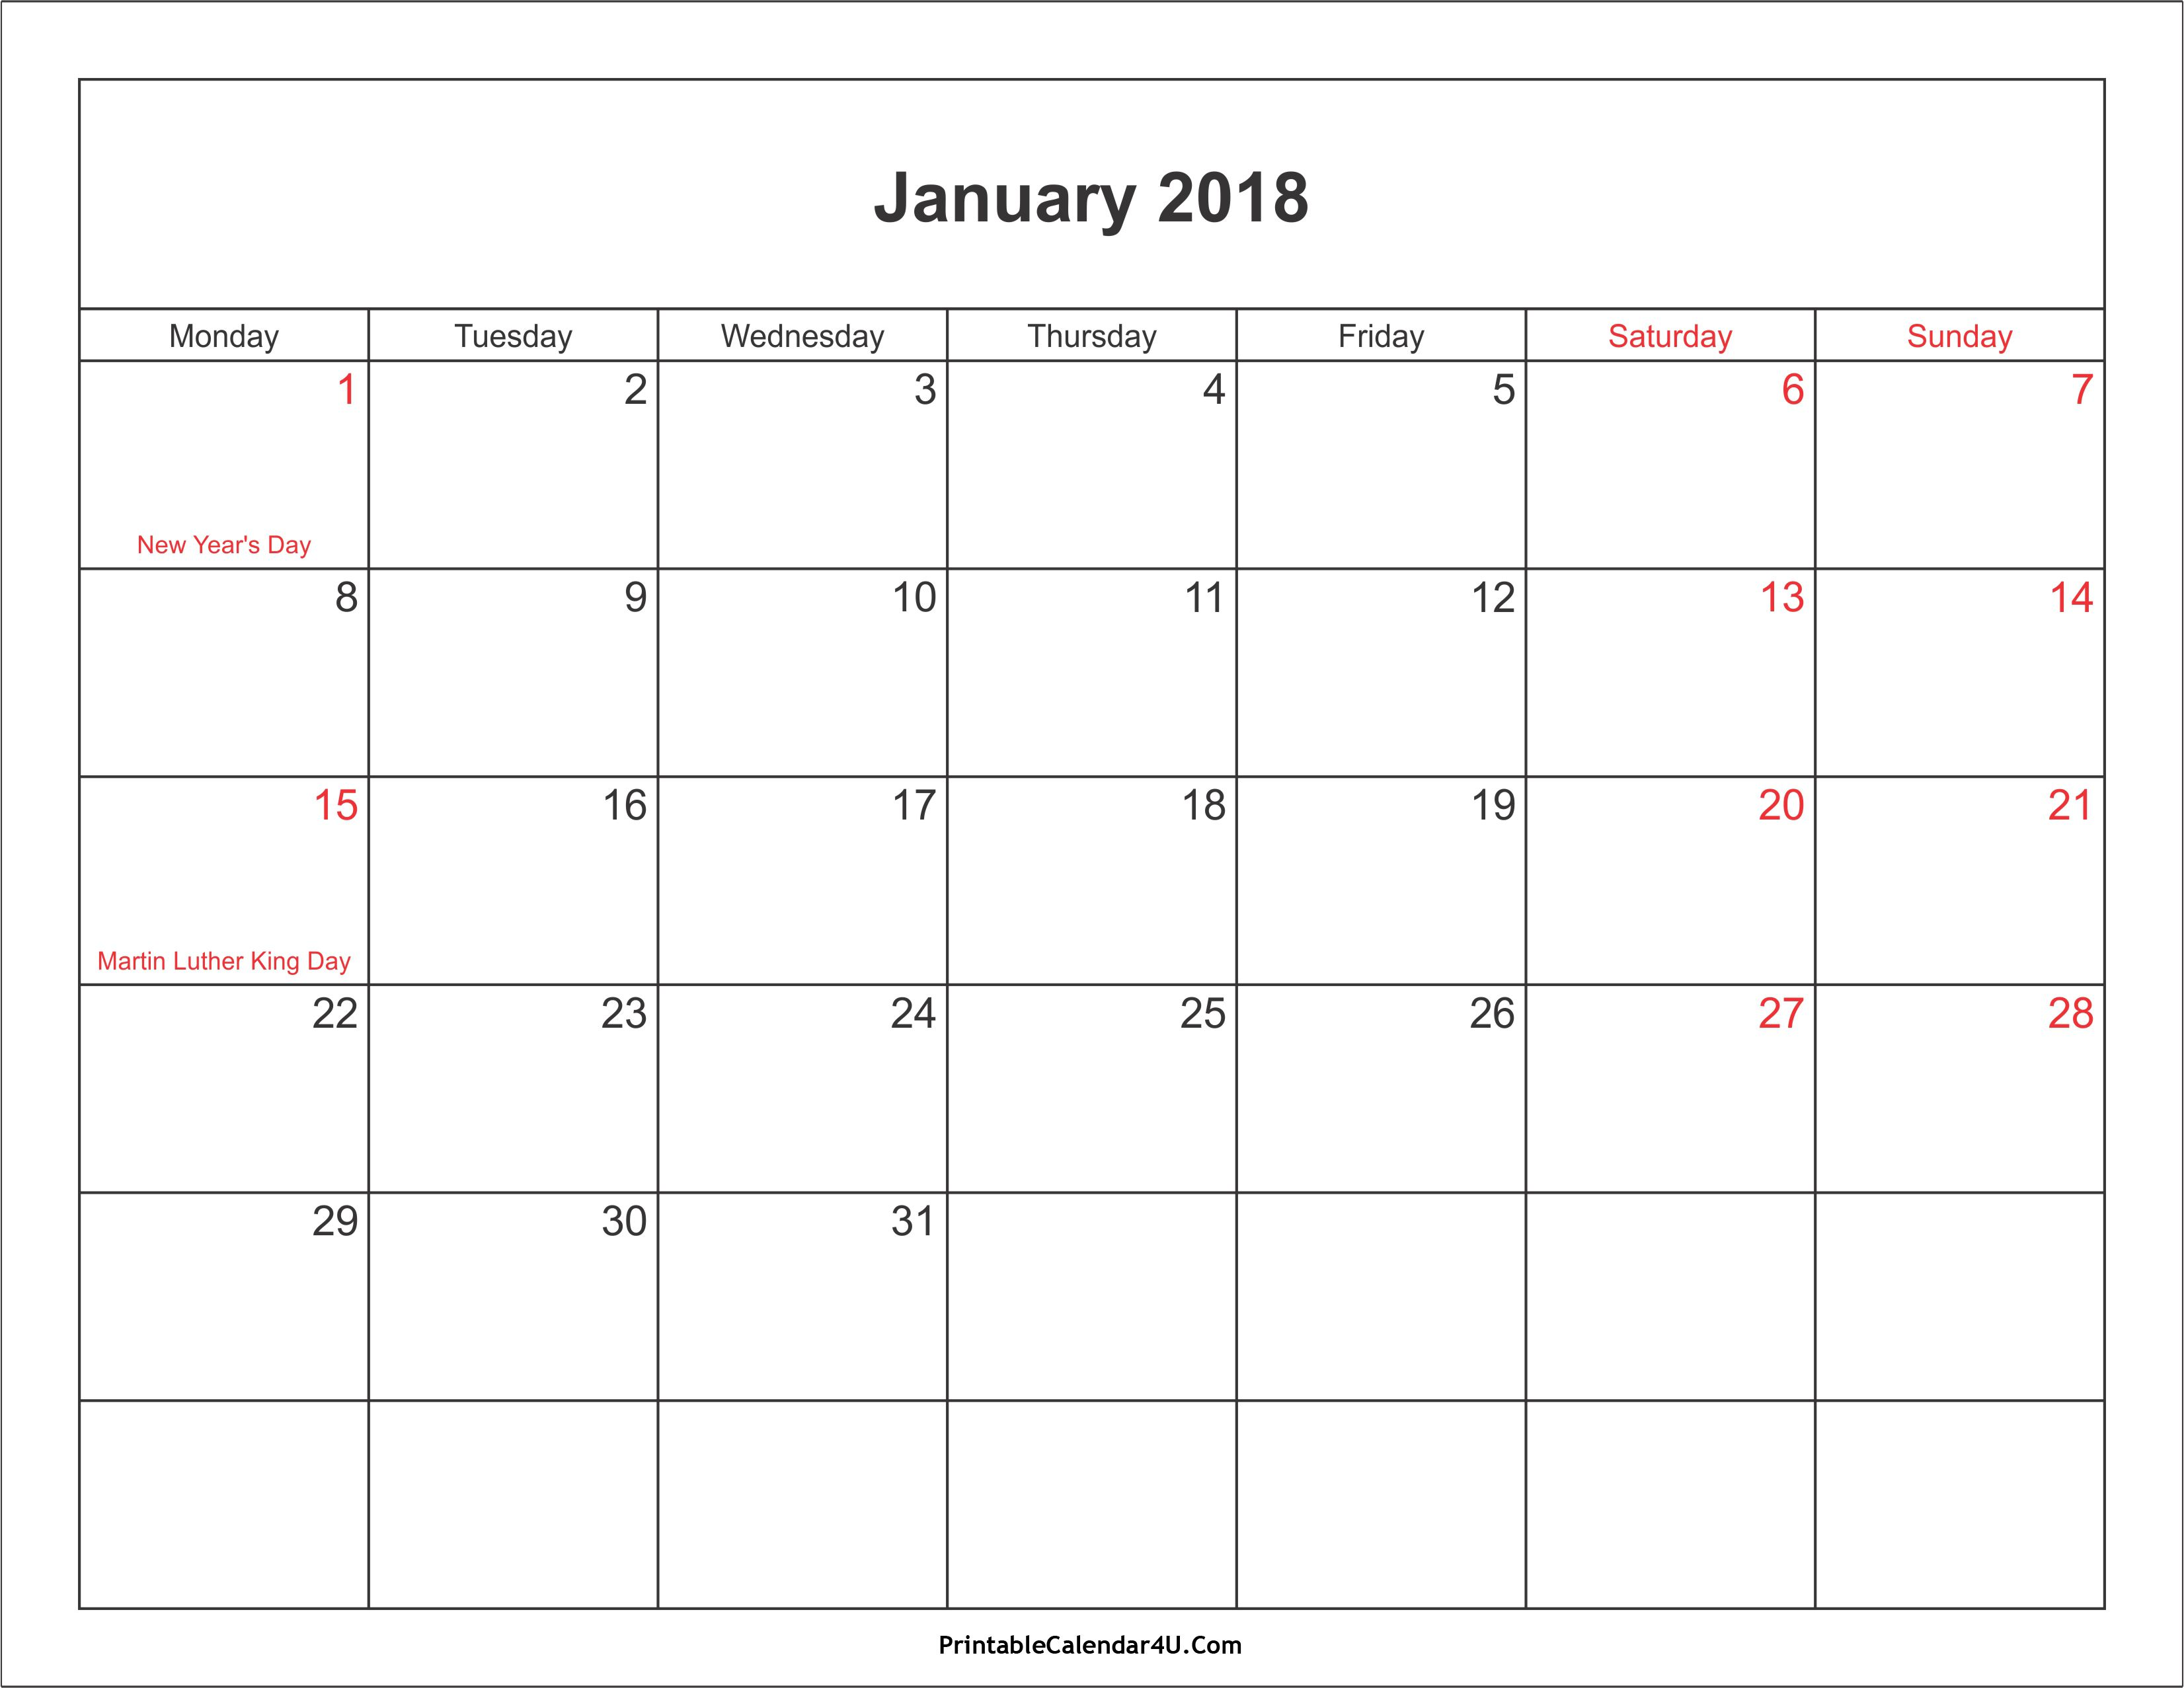 January Calendar Printable With Holidays And